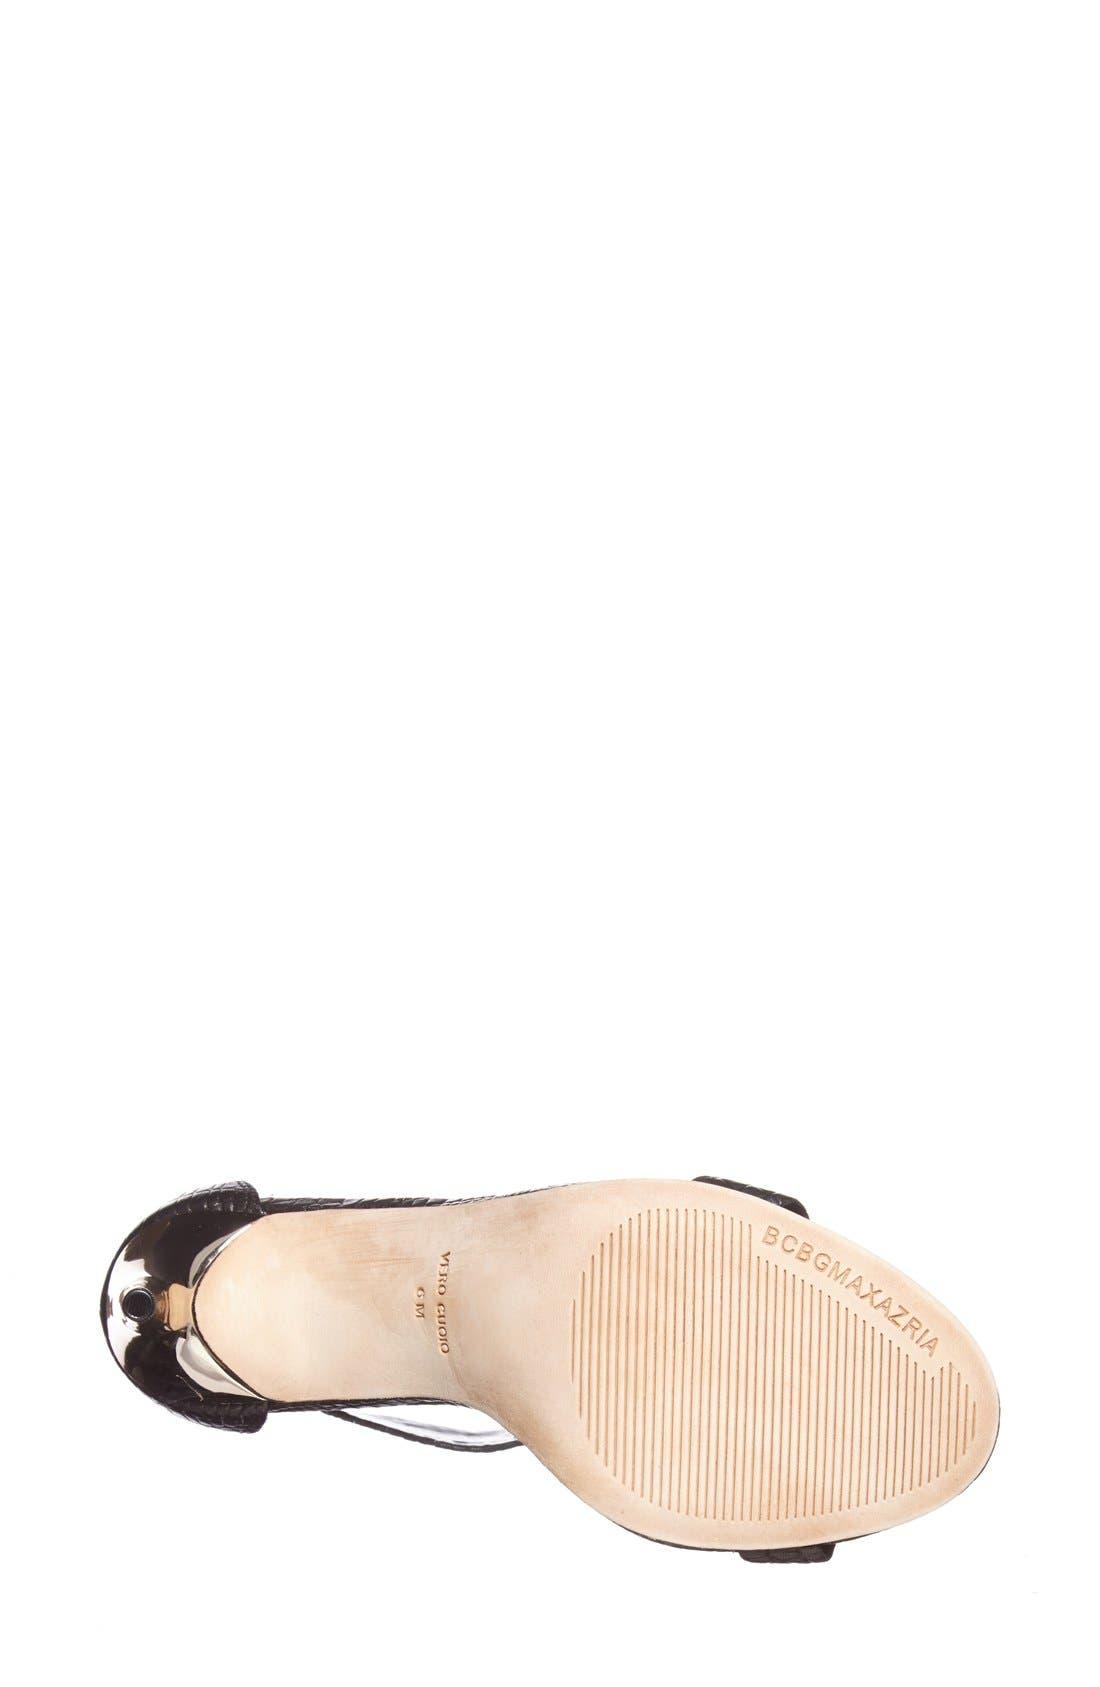 BCBGMAXAZRIA, 'Polaris' Sandal, Alternate thumbnail 6, color, 001